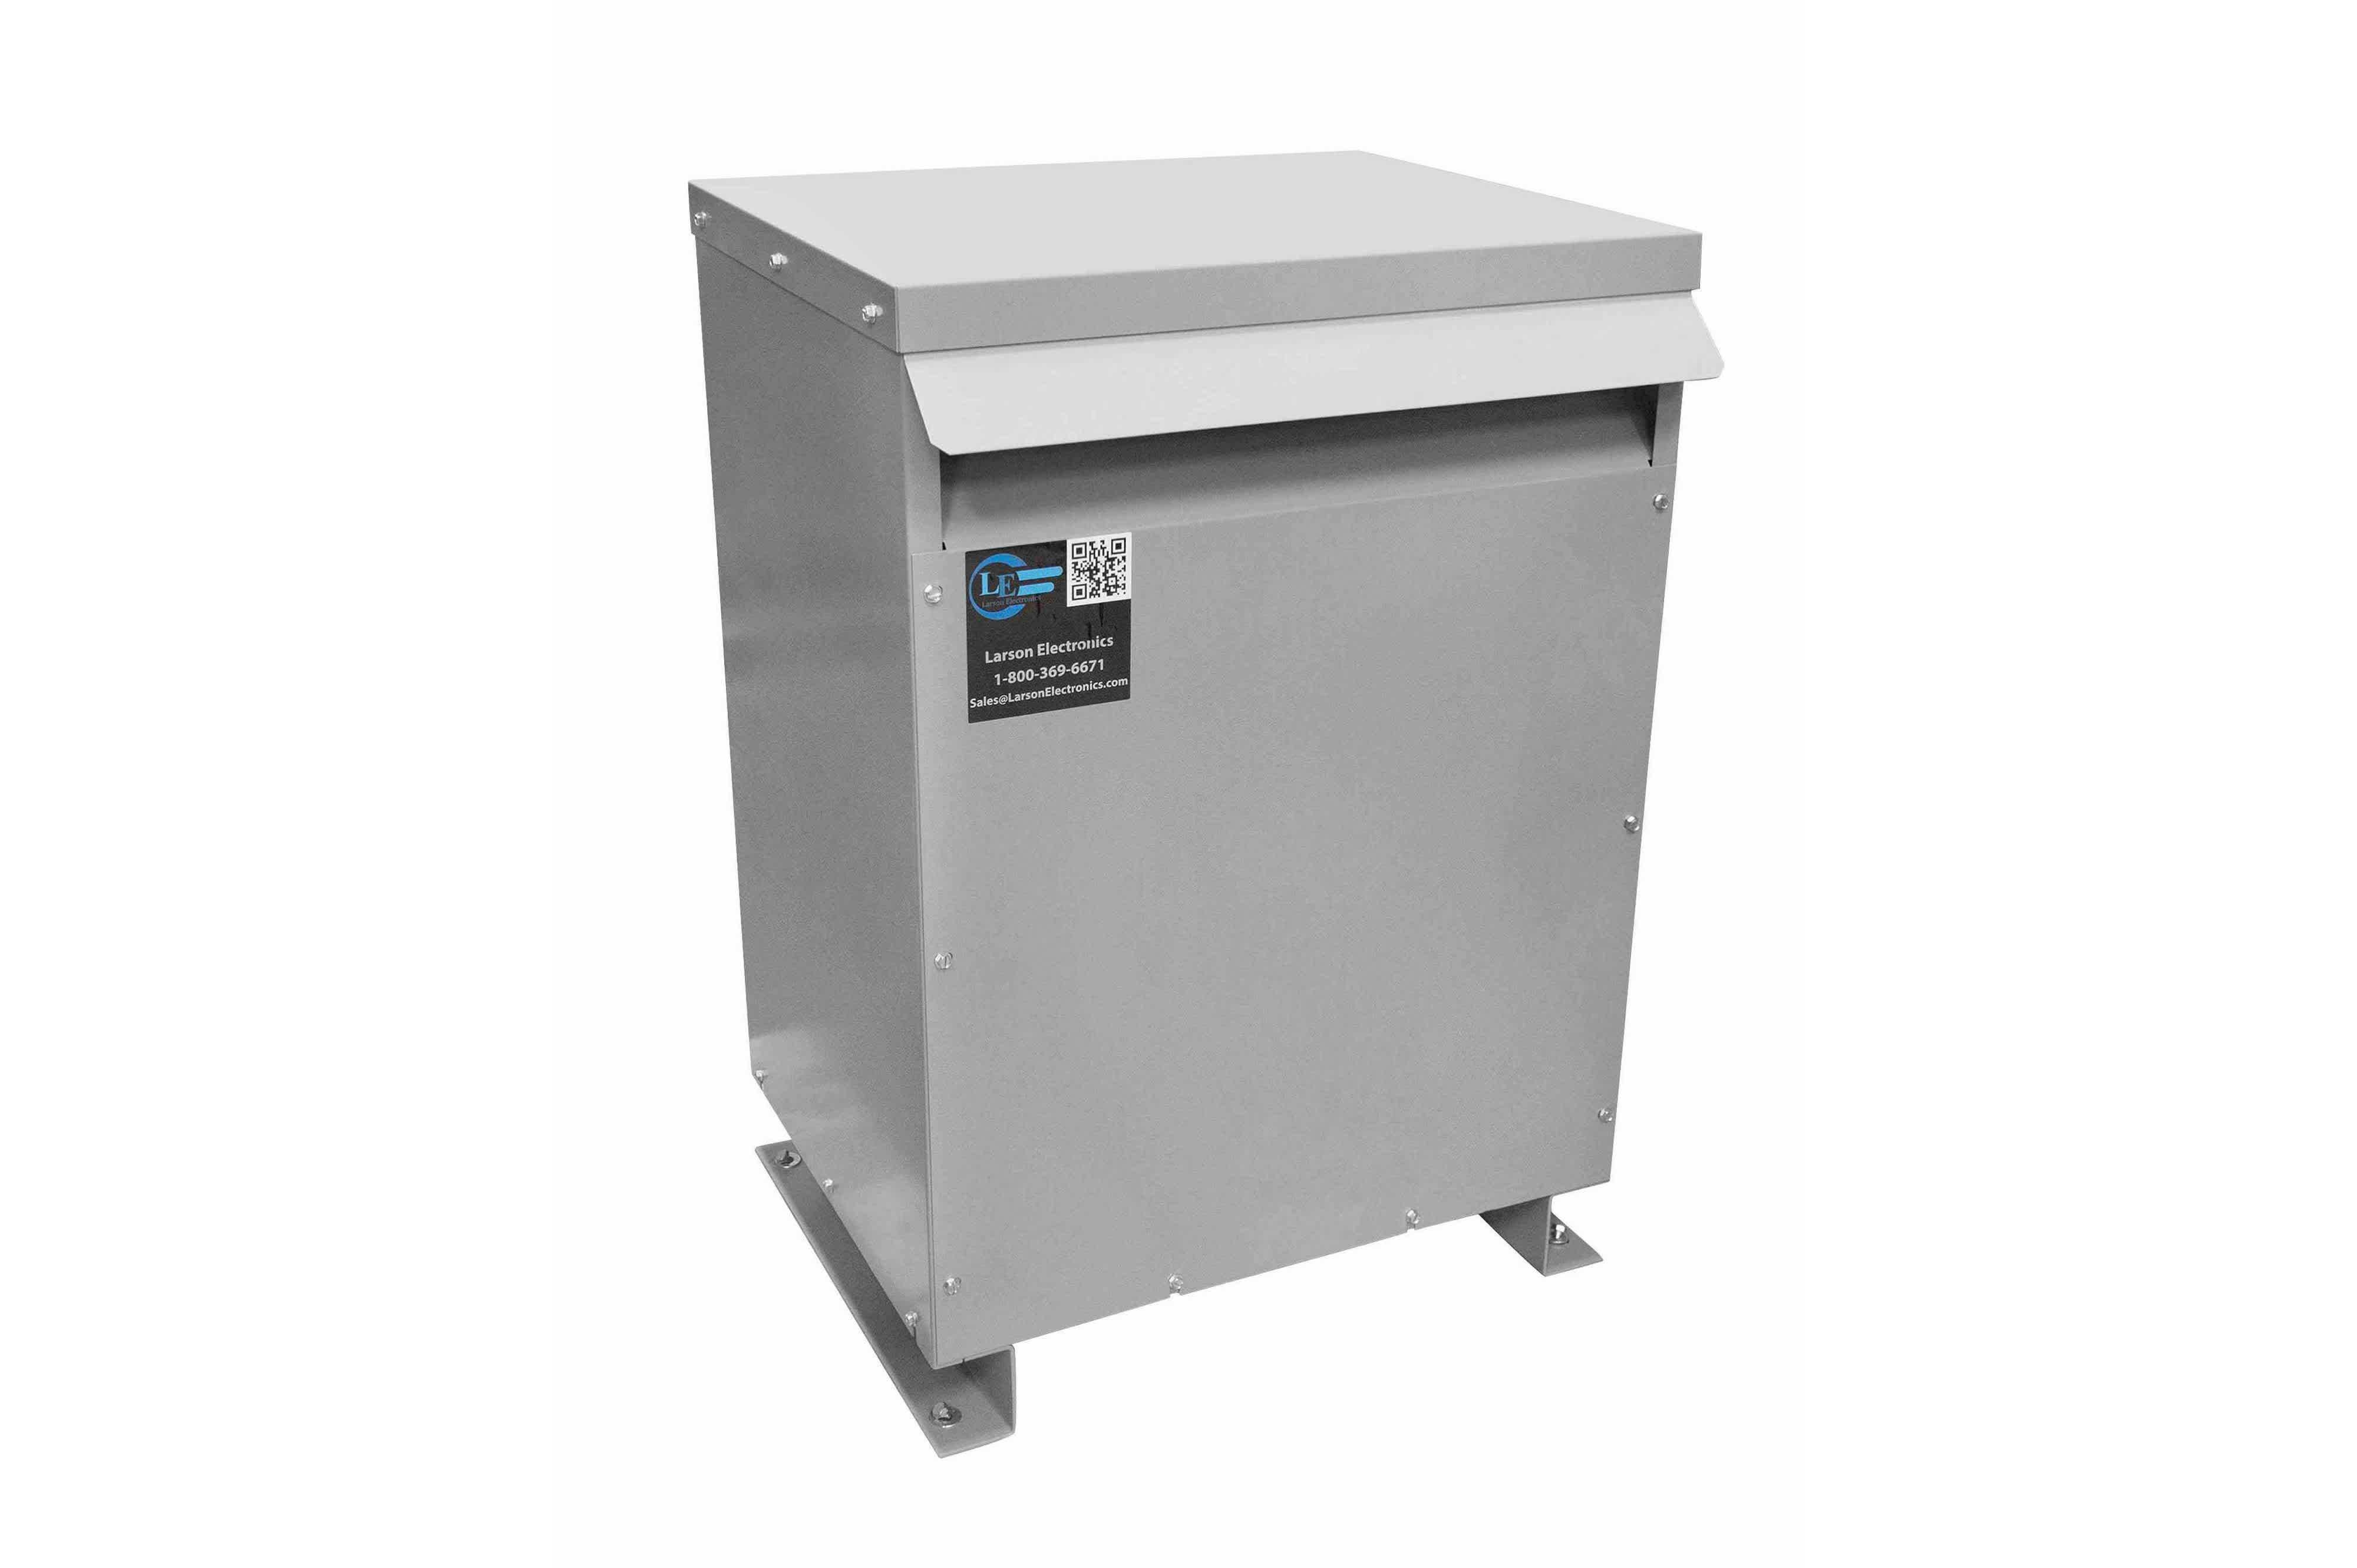 200 kVA 3PH Isolation Transformer, 480V Wye Primary, 600Y/347 Wye-N Secondary, N3R, Ventilated, 60 Hz